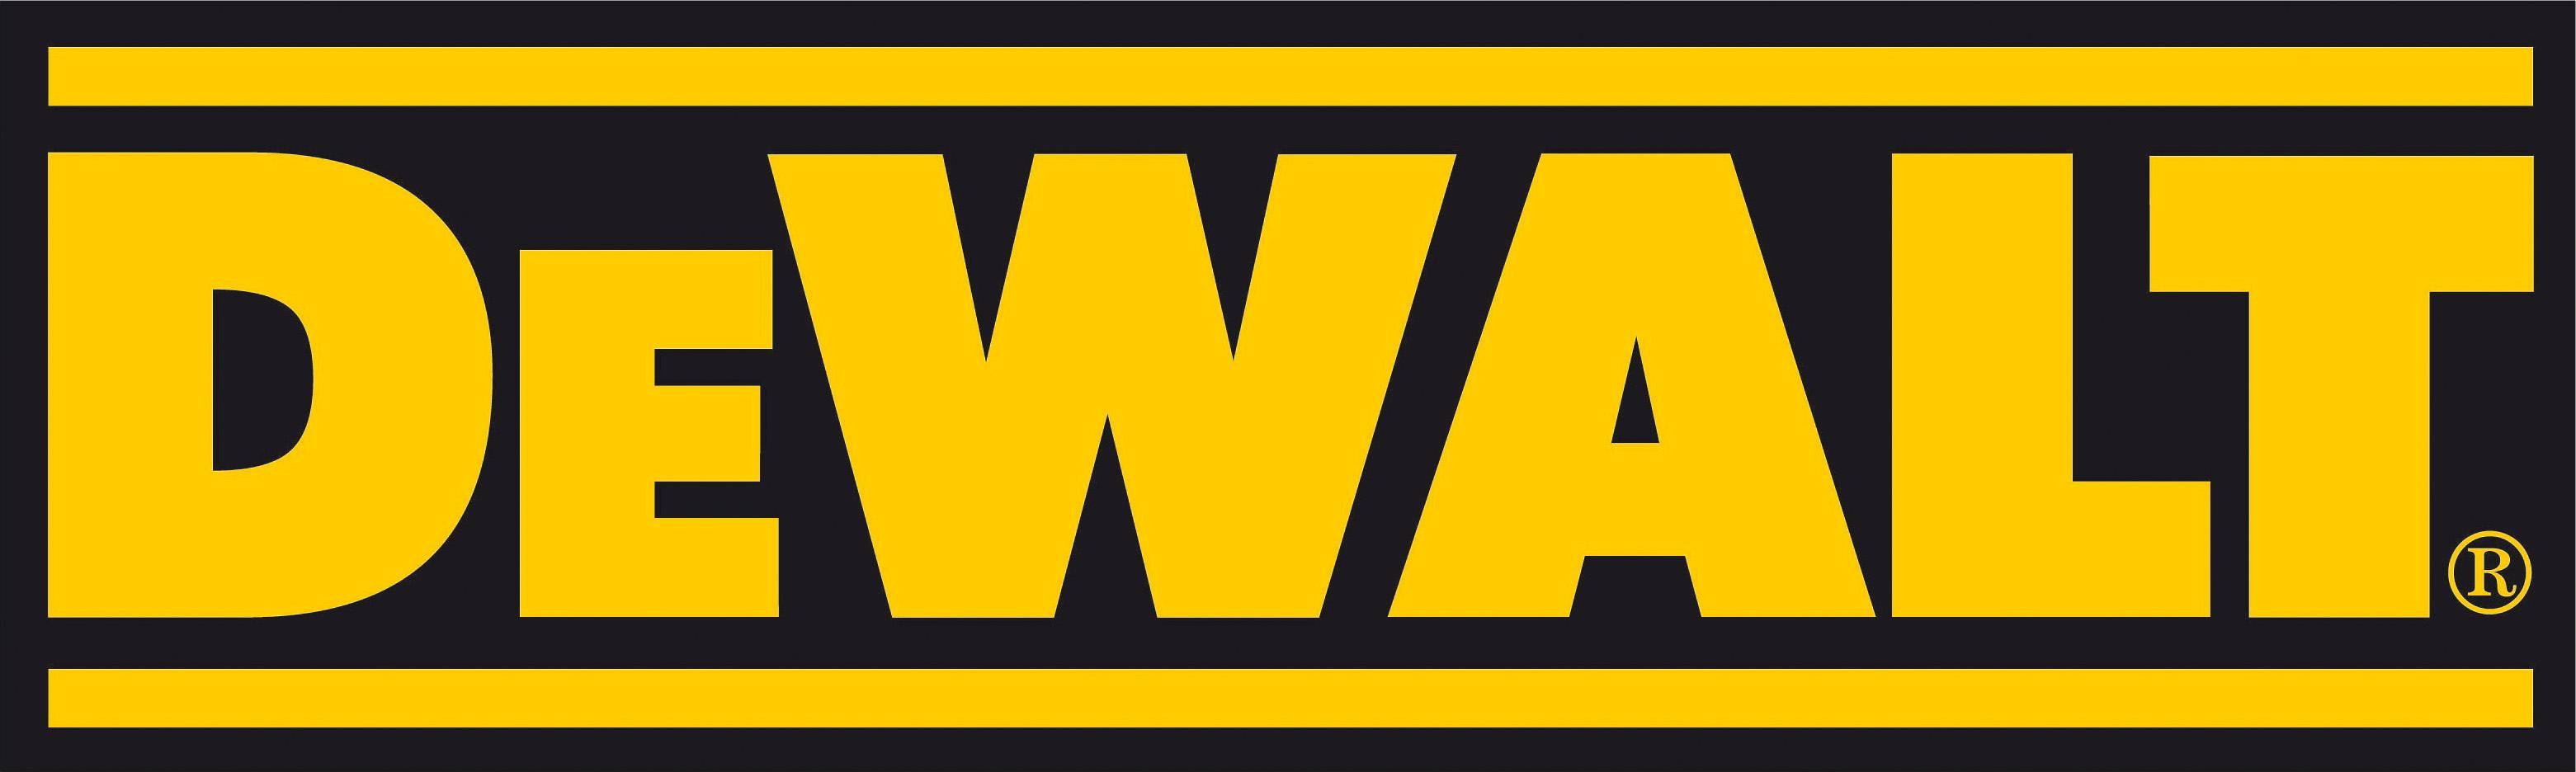 Dewalt logo clipart banner black and white library DeWalt logo — HomCo Lumber & Hardware banner black and white library